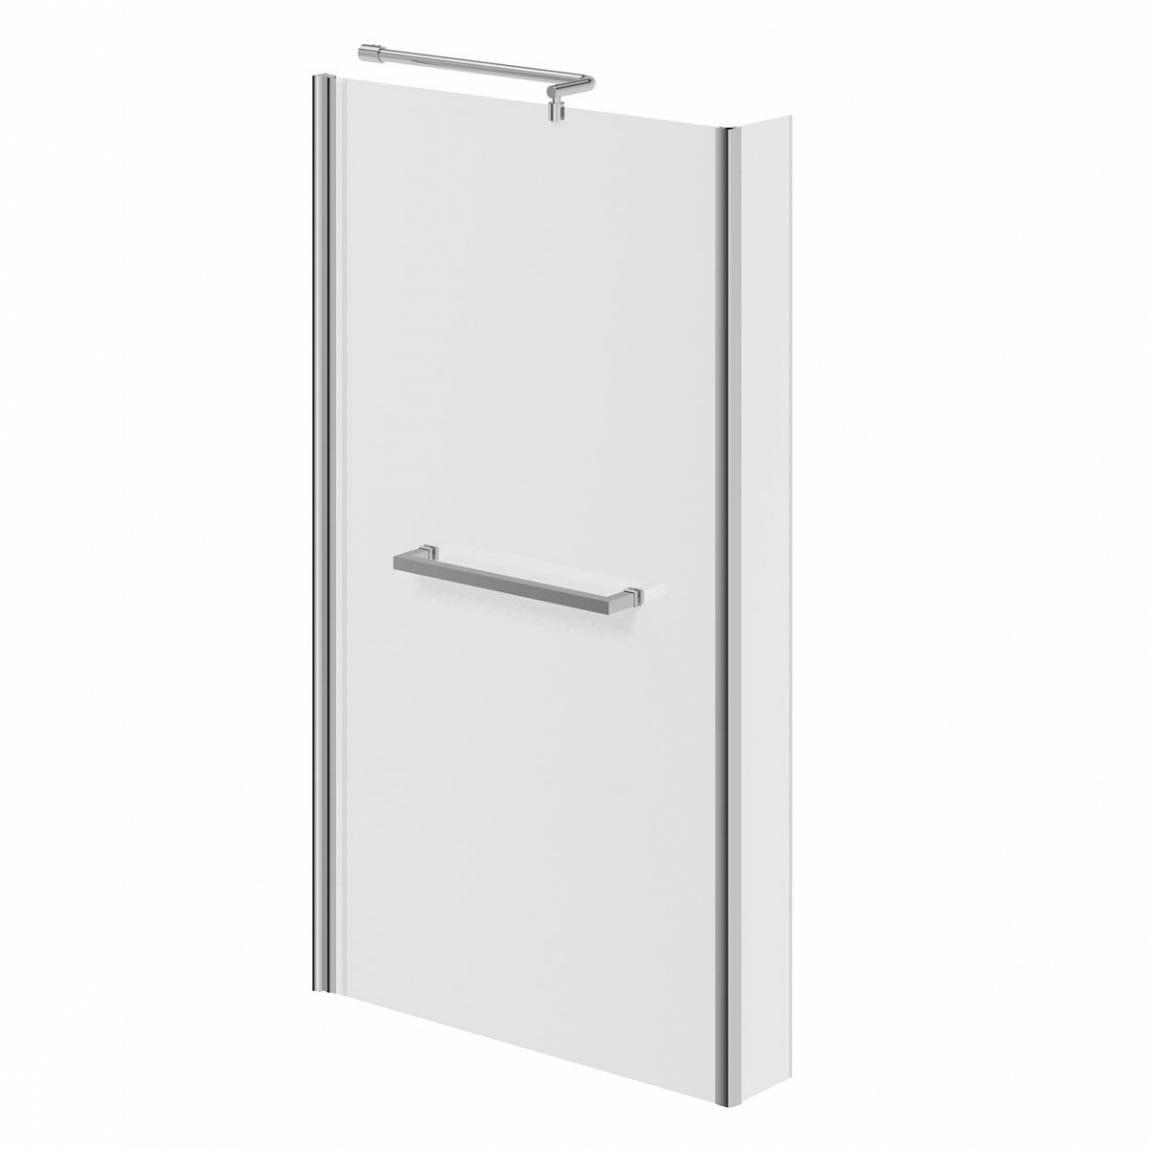 6mm L shaped shower bath screen with rail